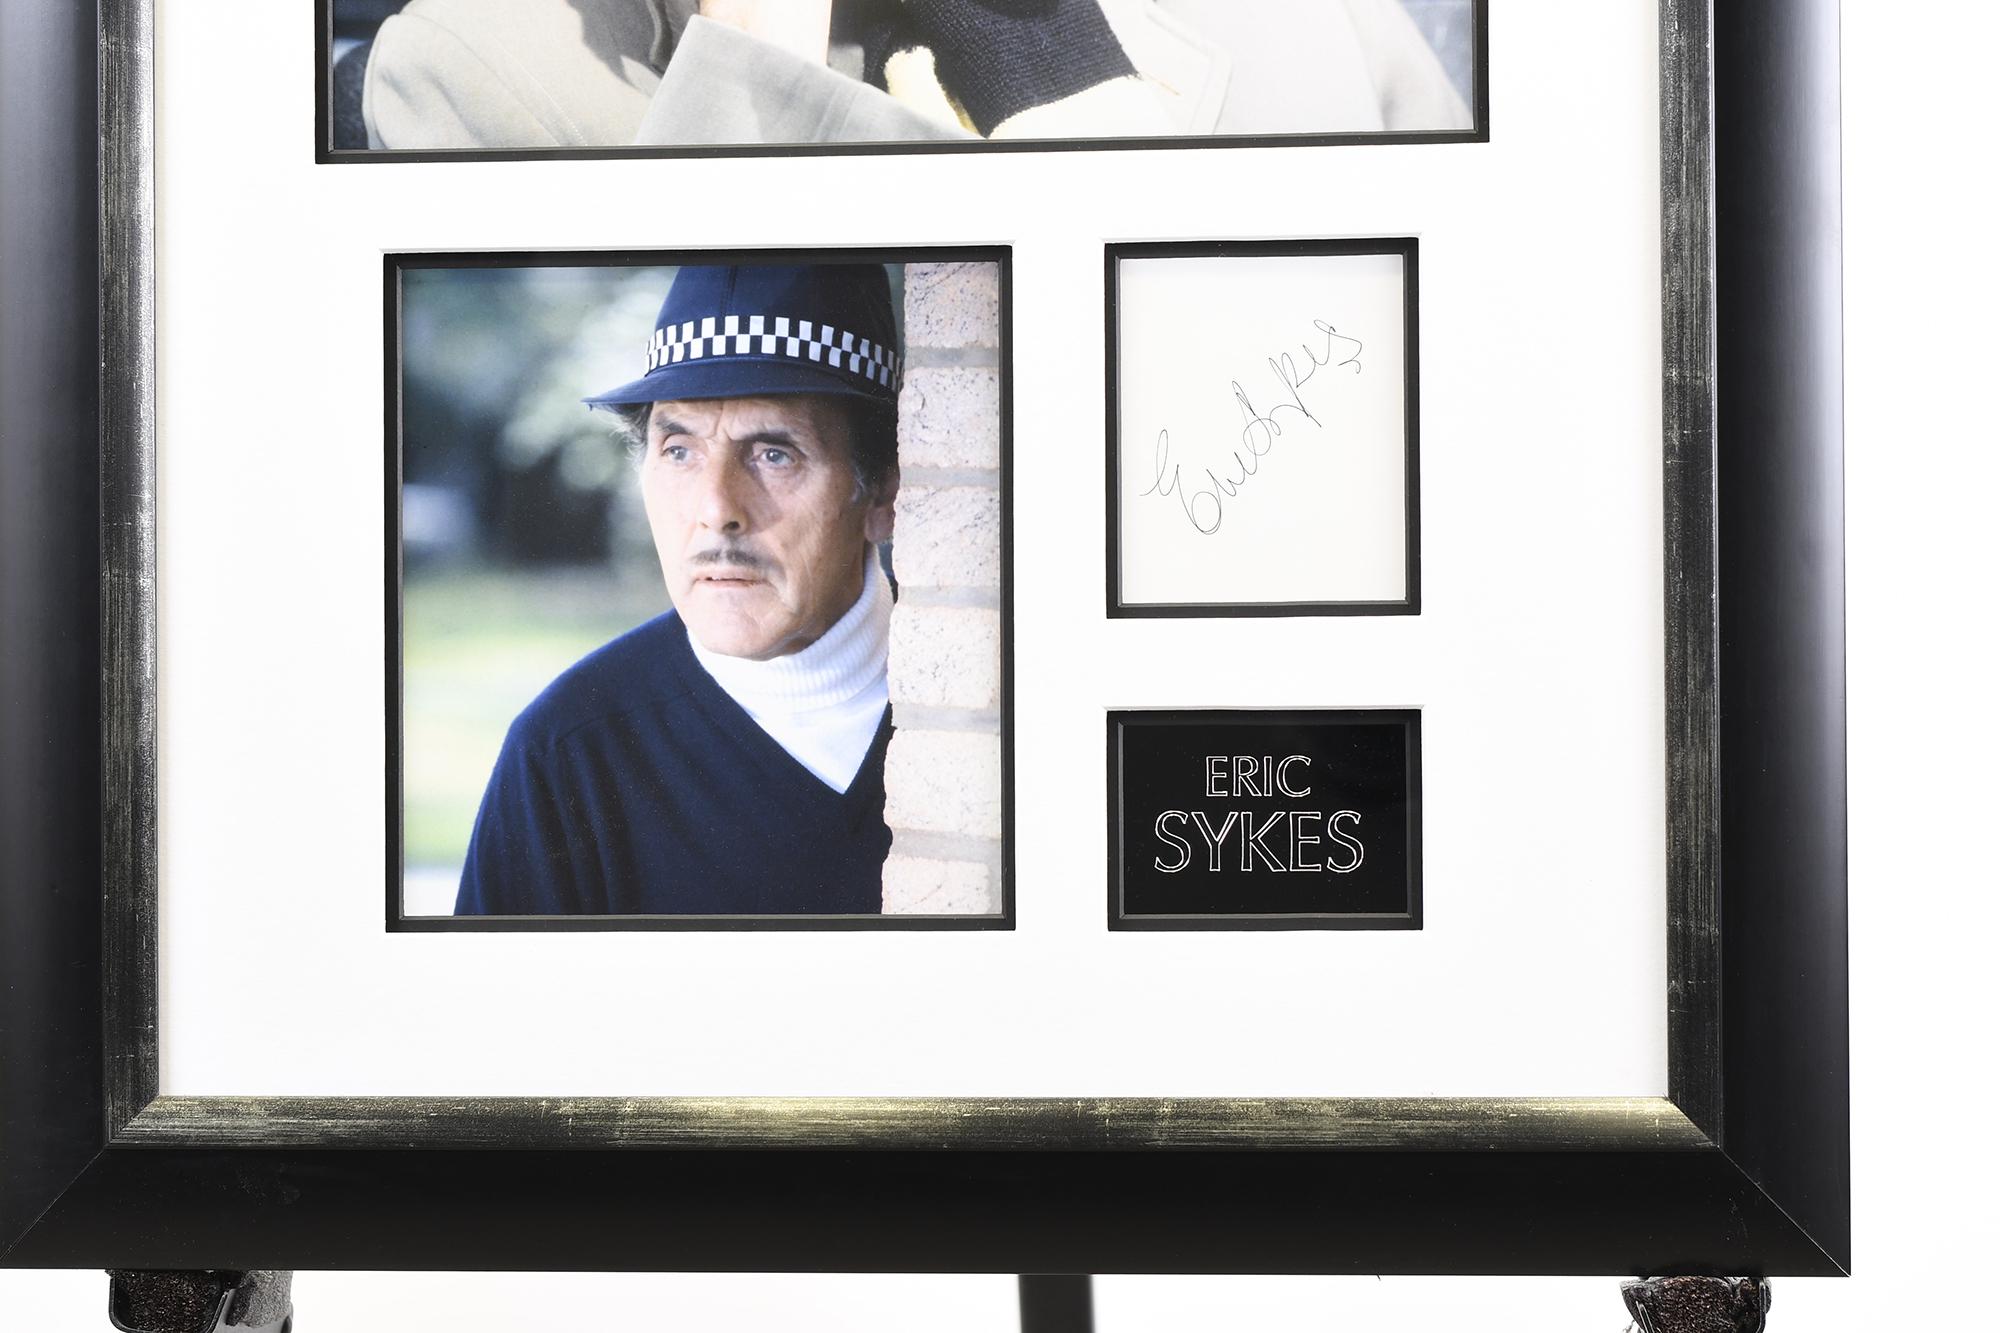 Eric Sykes Framed Memorabilia Presentation - Image 2 of 4